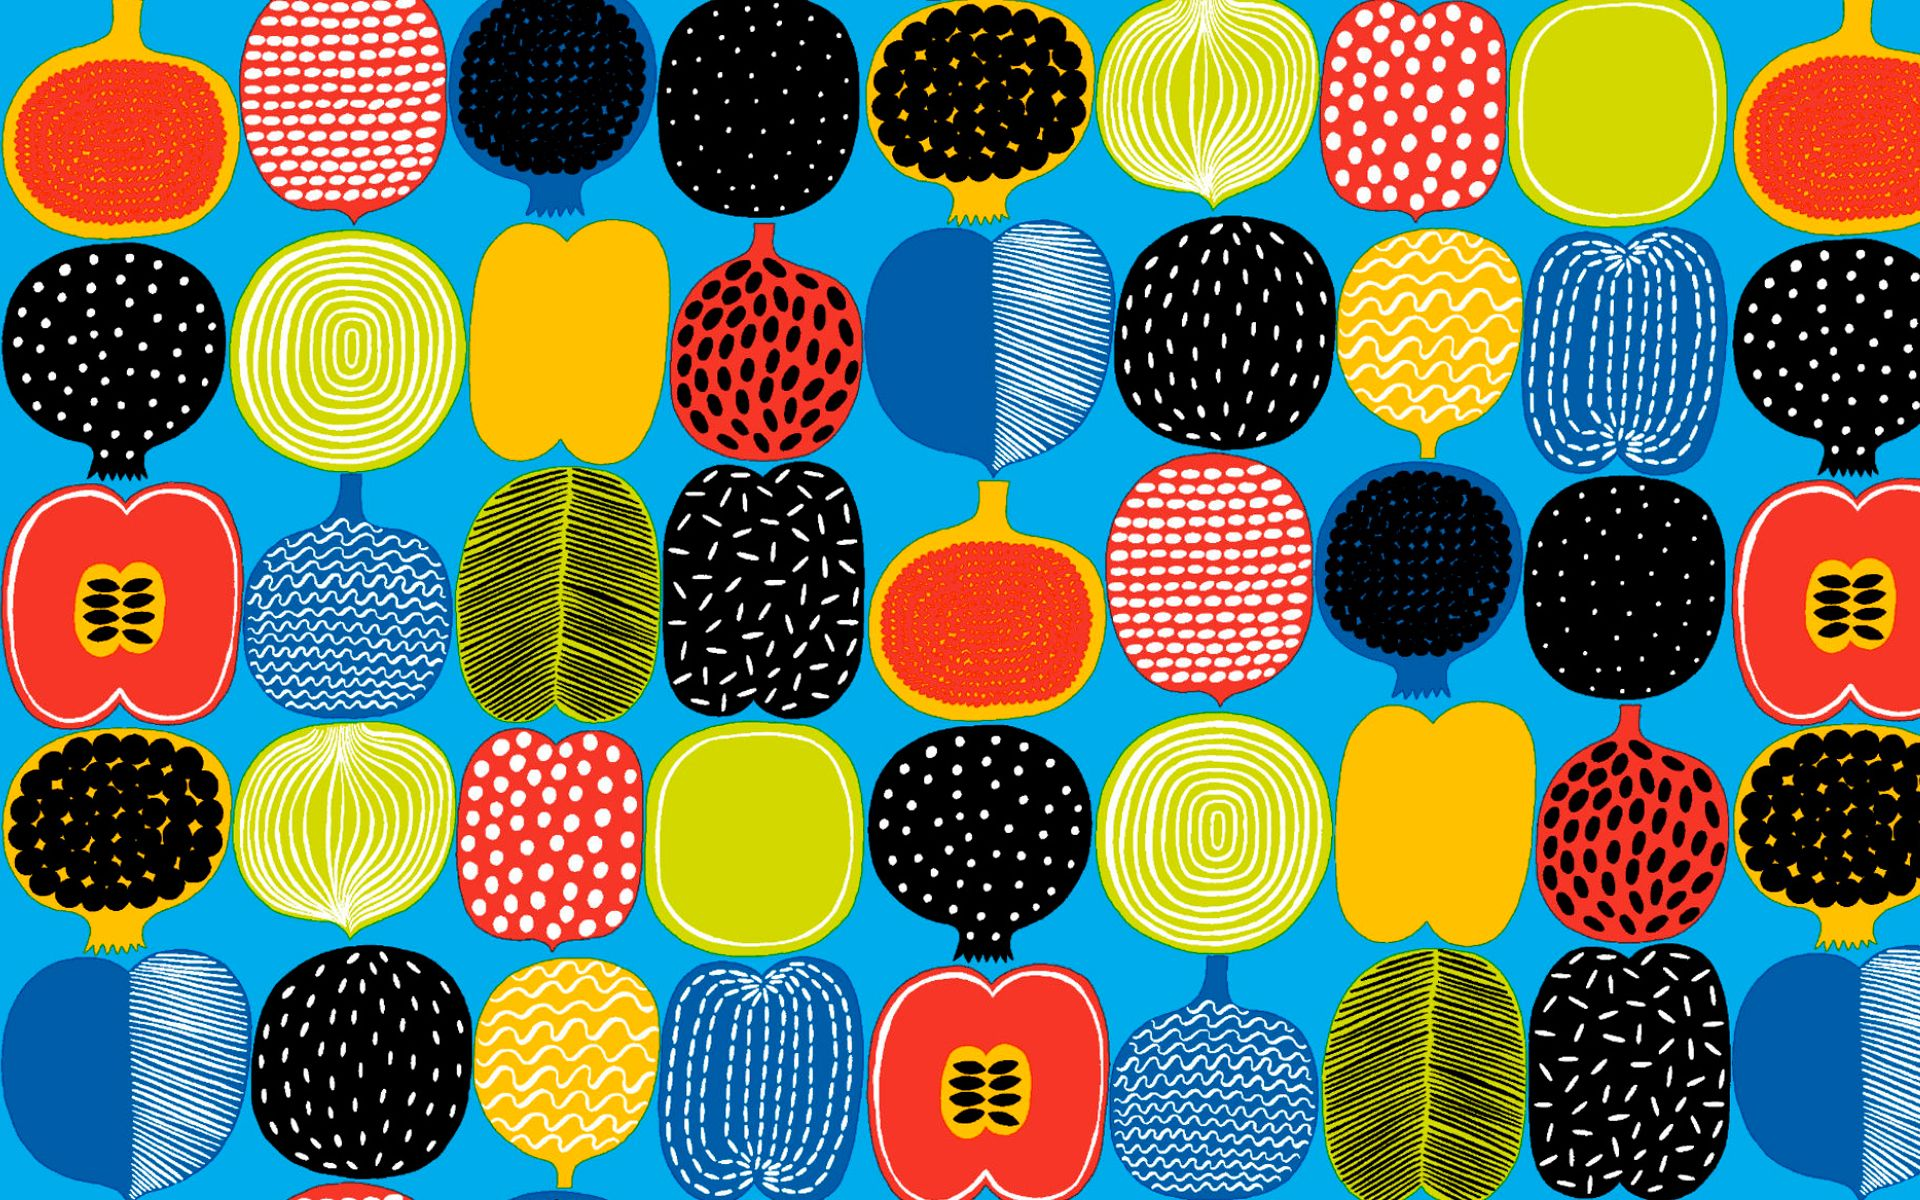 Super Duper Cute Wallpapers Marimekko Desktop Wallpapers Marimekko Design Ideas